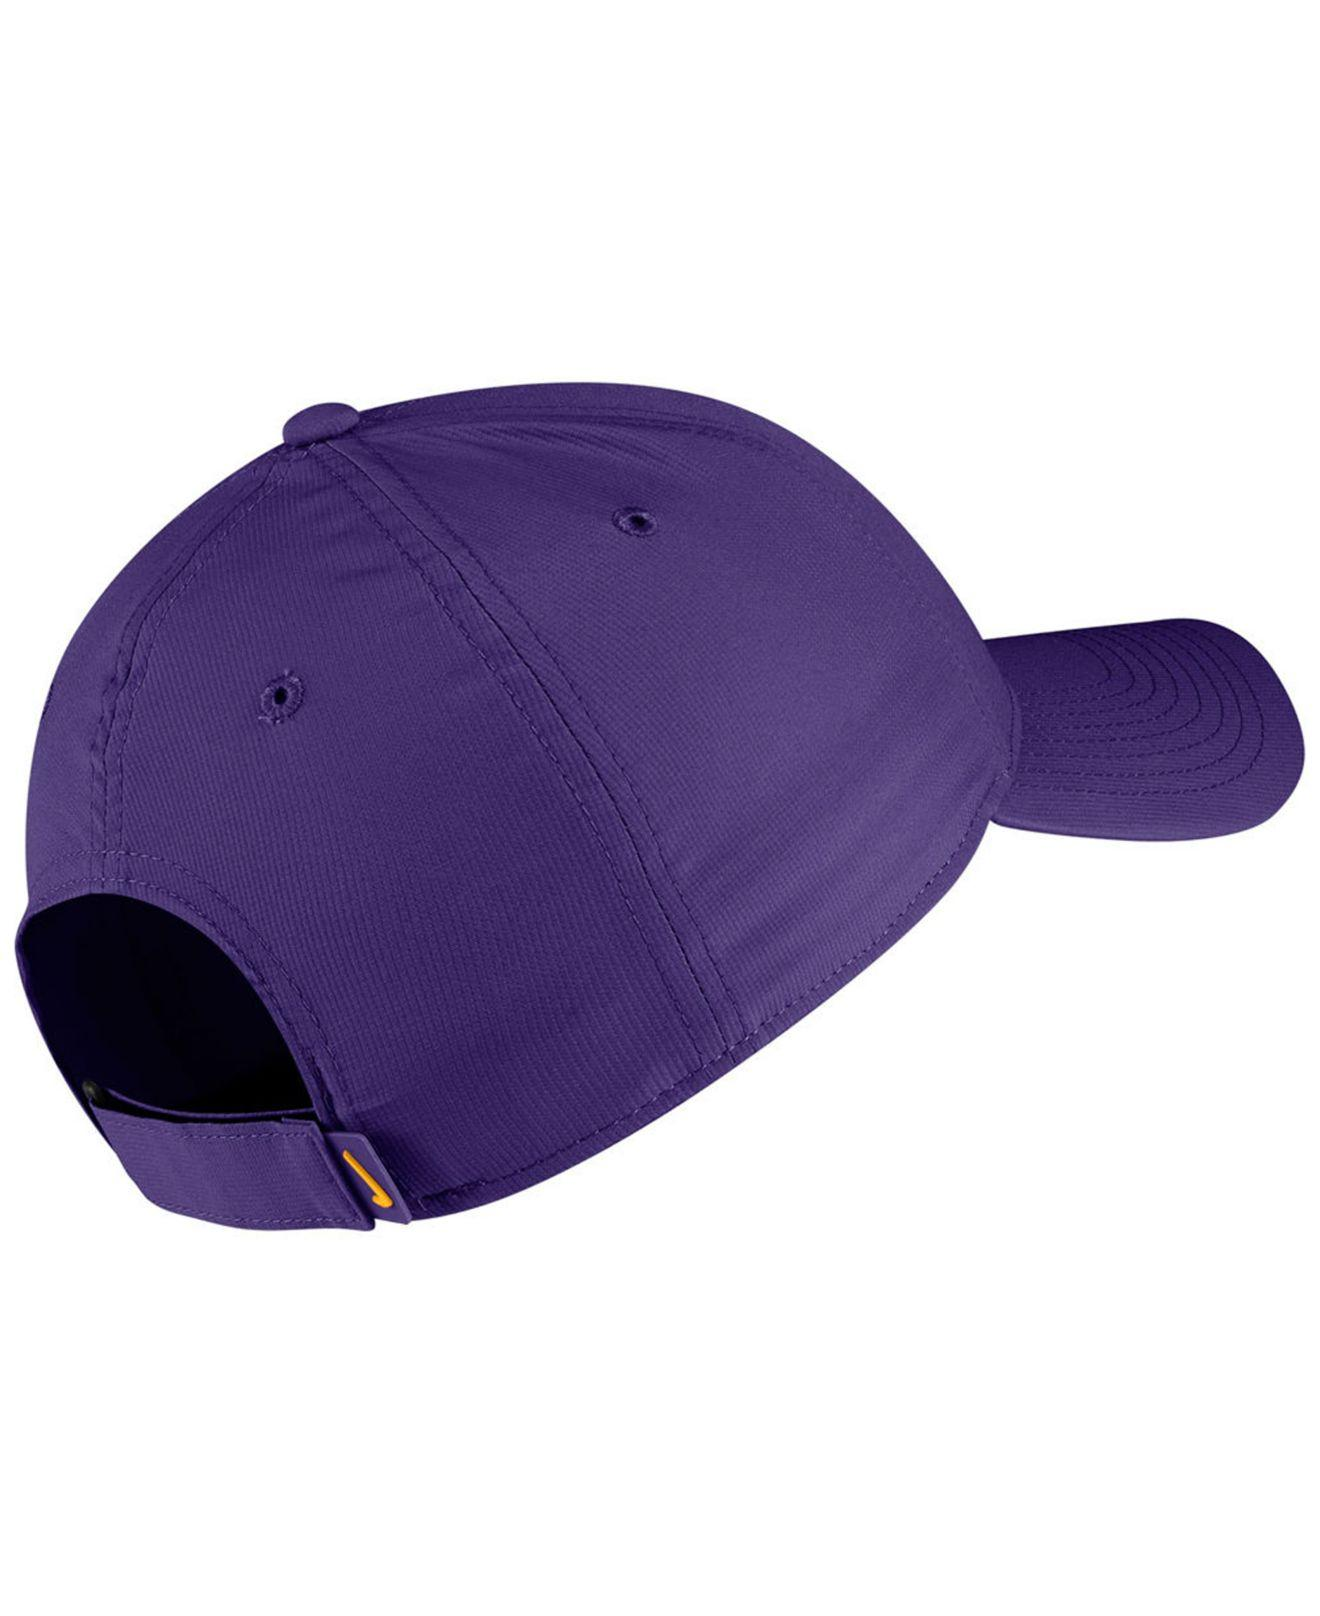 00277e72bcbdd Lyst - Nike Lsu Tigers Dri-fit Adjustable Cap in Purple for Men